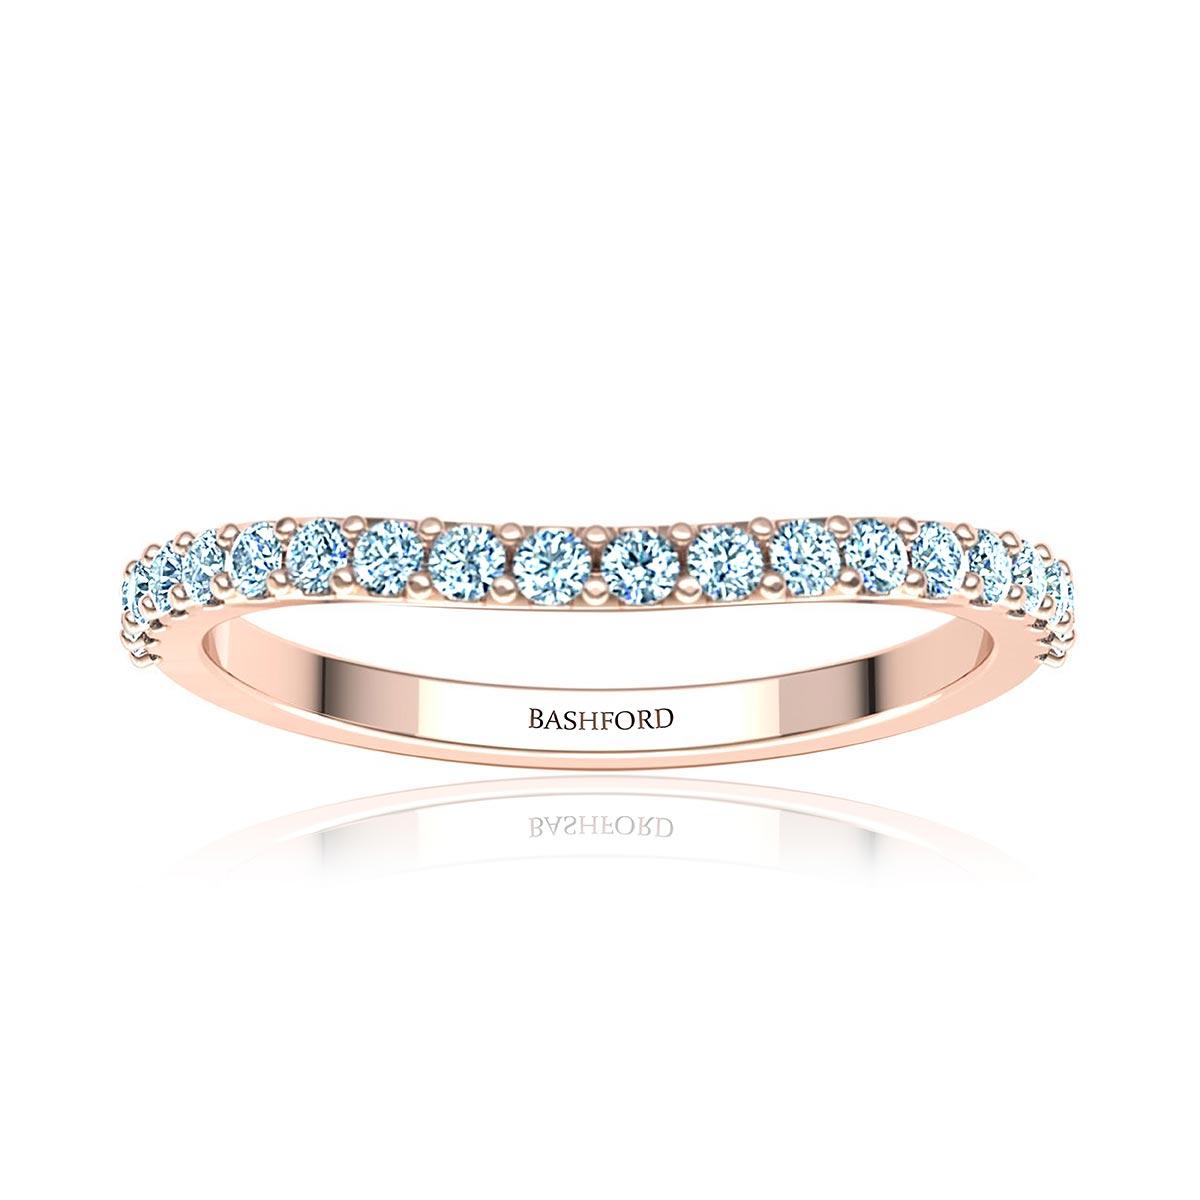 Weis Diamond Ring (1/3 CT. TW.)